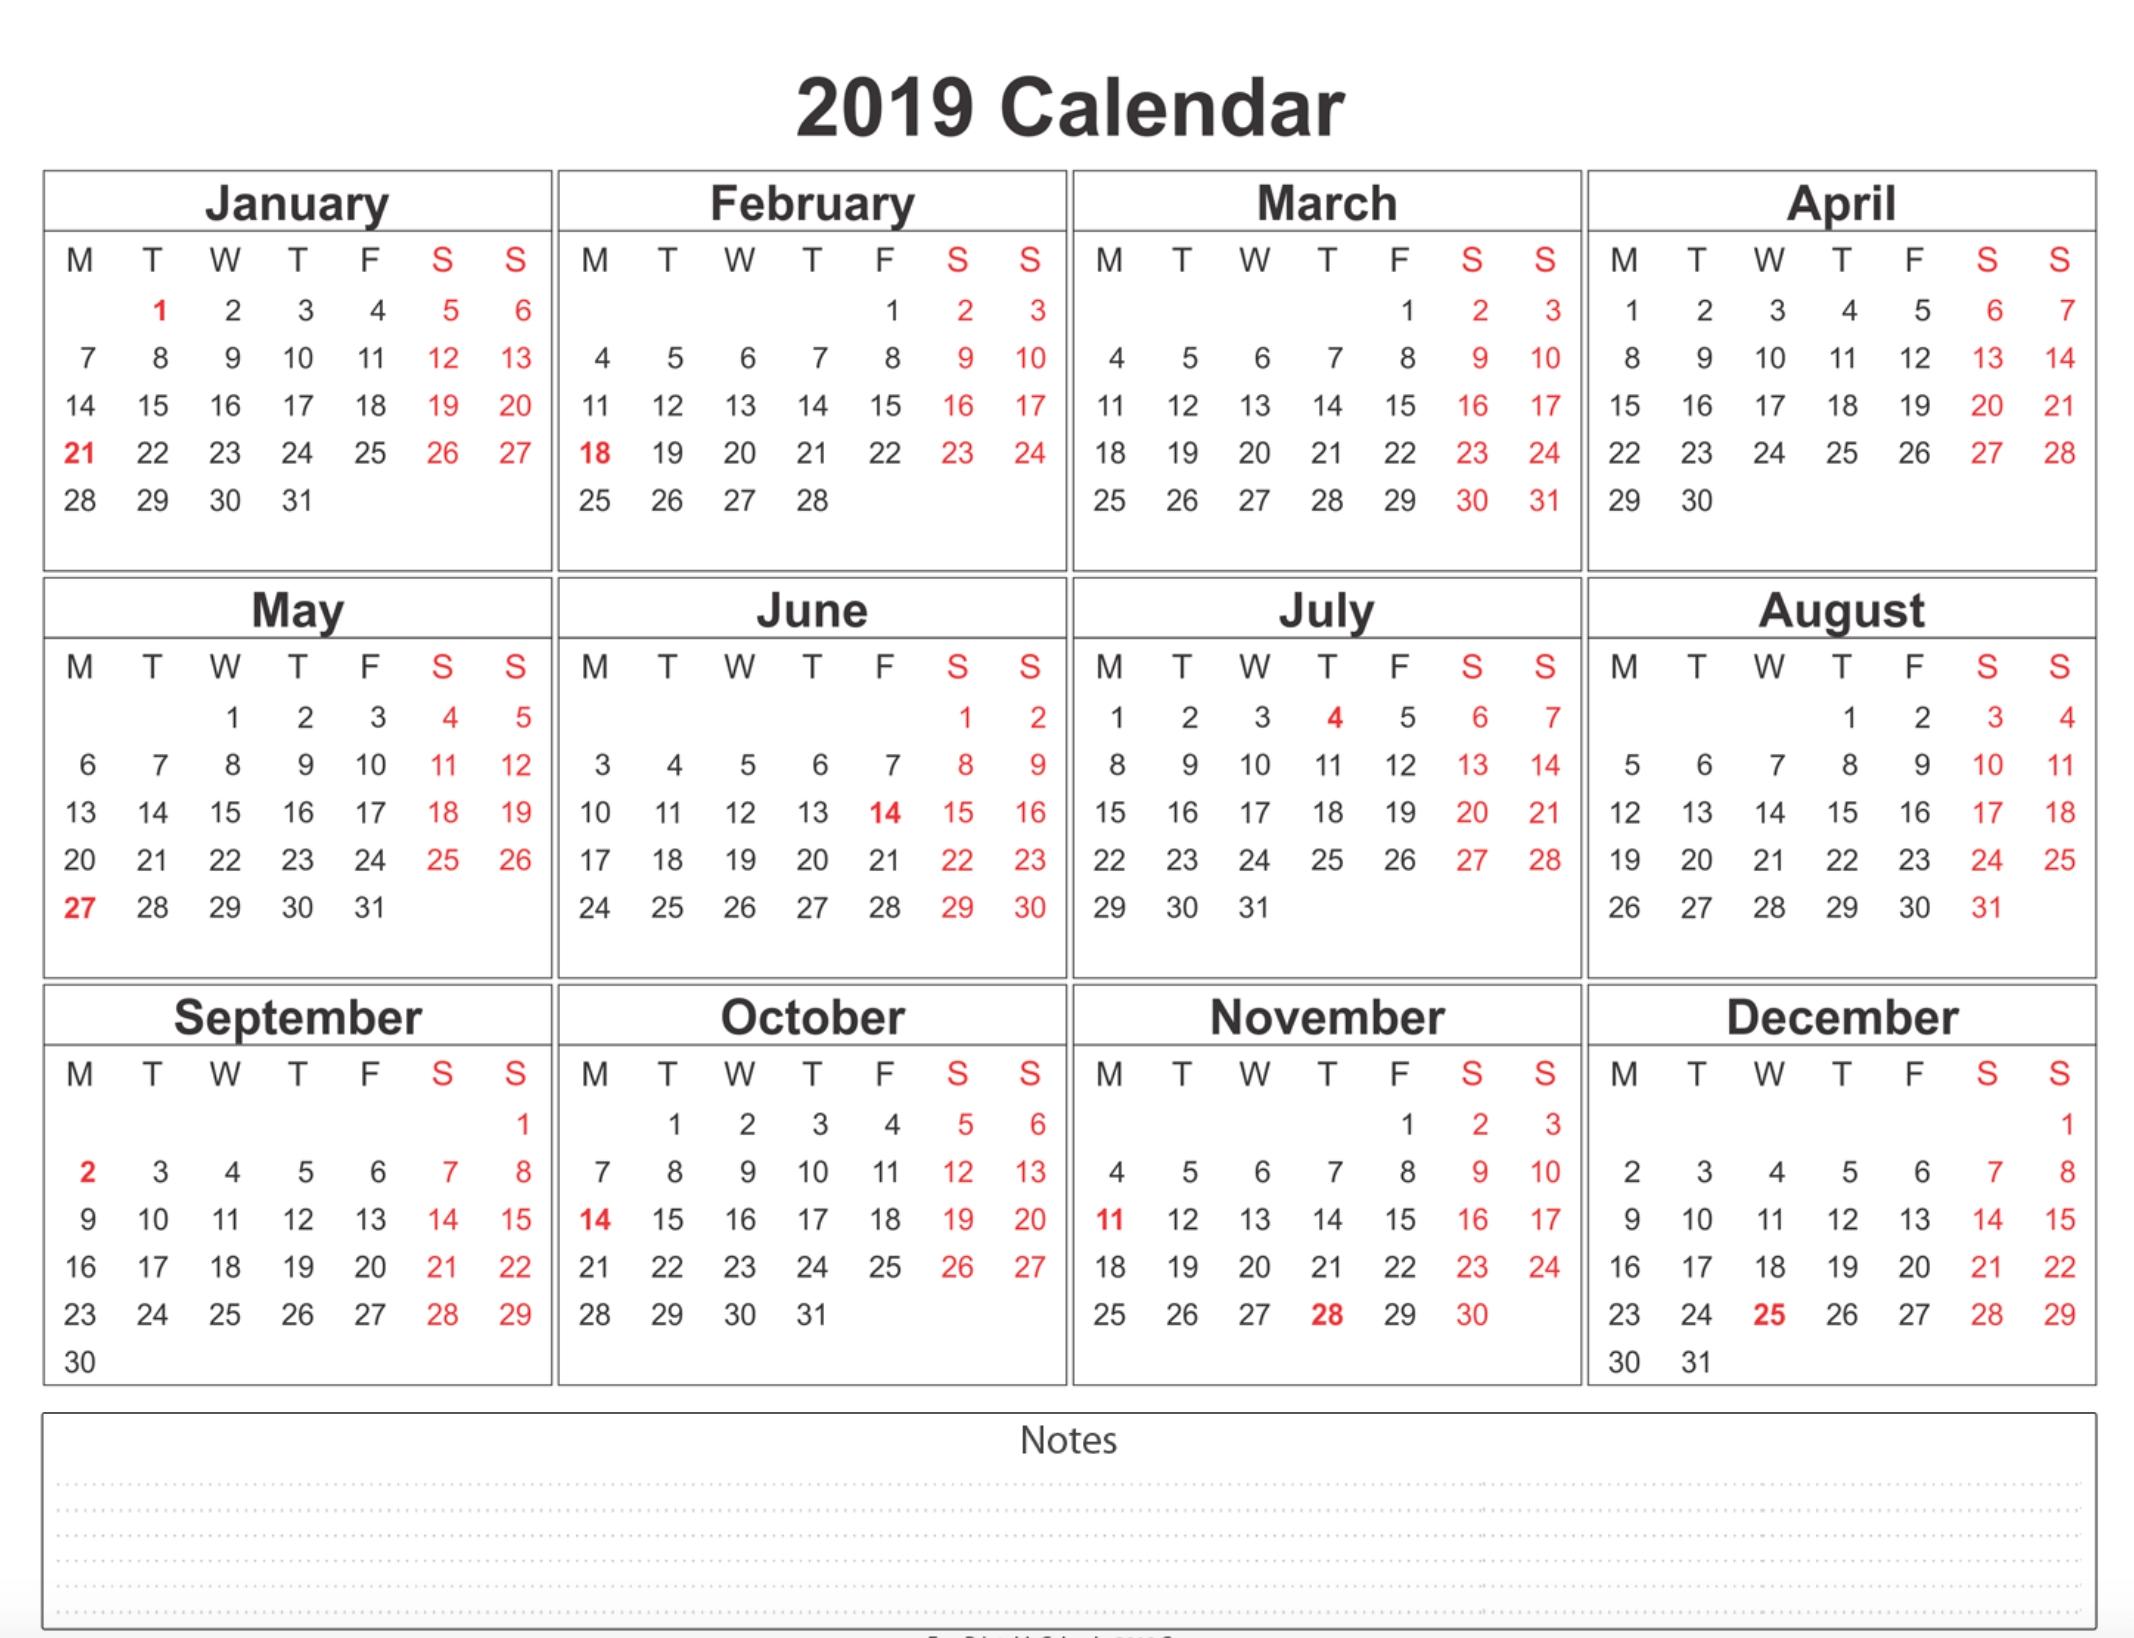 Free Printable Calendar 2019 | Weekly Calendar Printable  Free 12 Month Printable Calendars